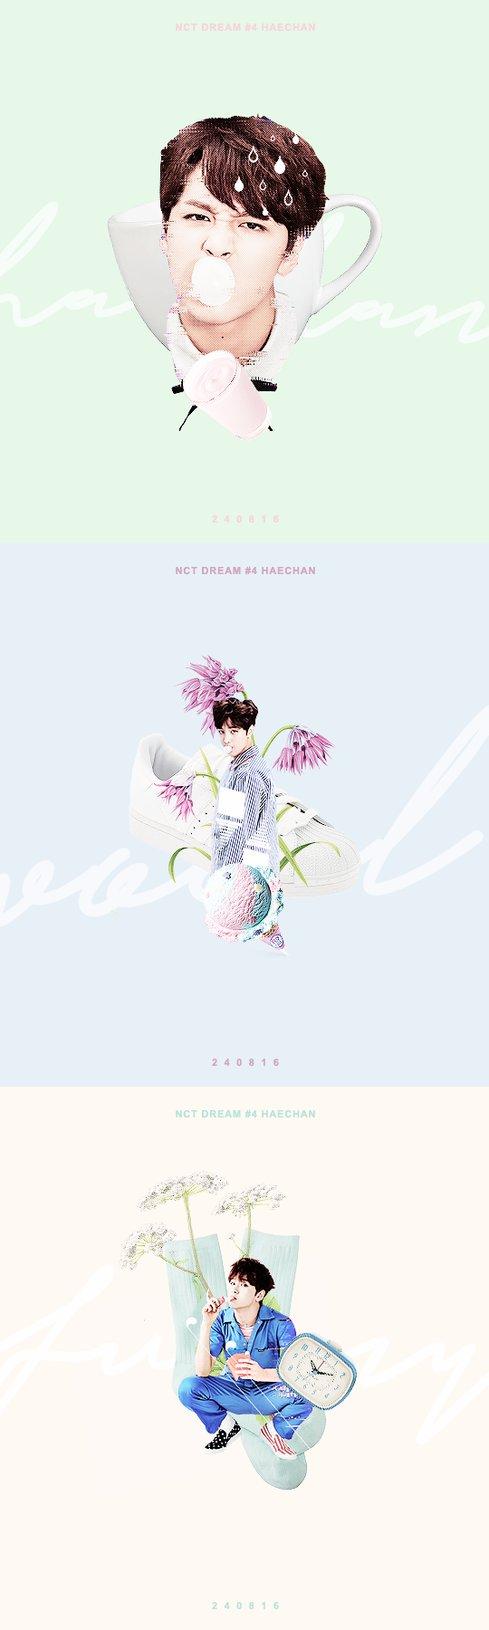 [ NCT Dream ] #4 Haechan by meowheed